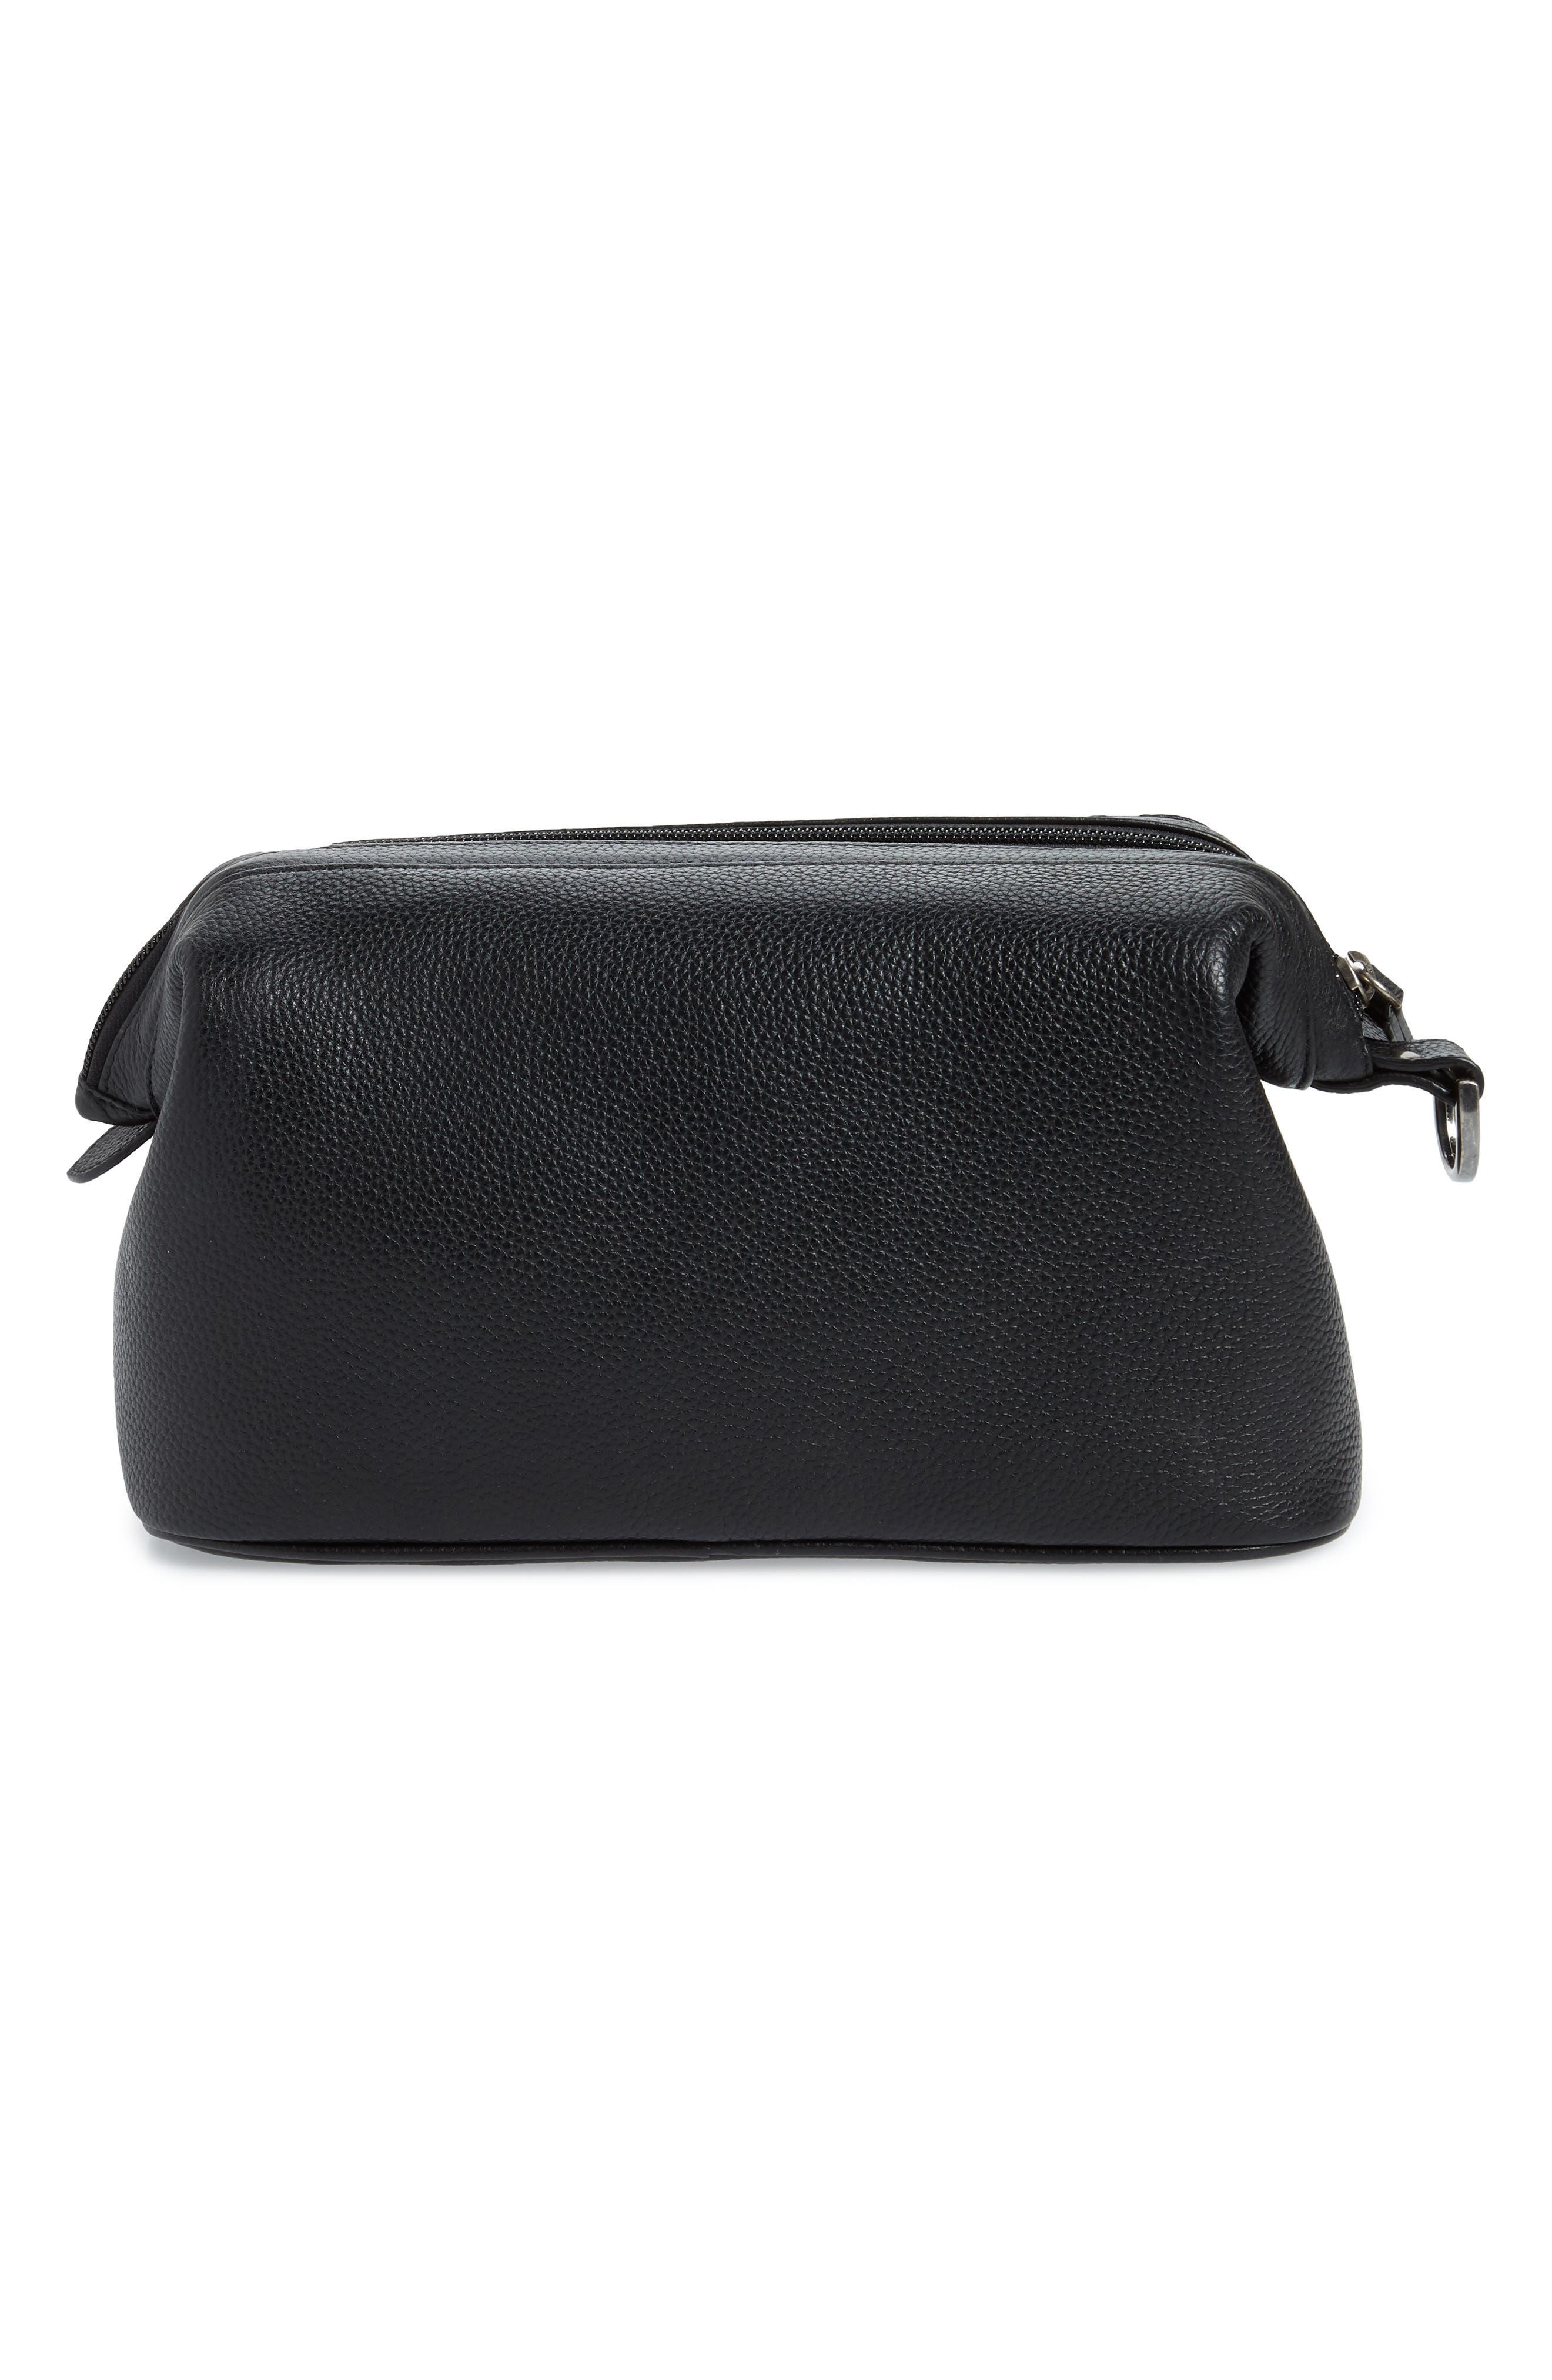 Midland Leather Dopp Kit,                             Alternate thumbnail 2, color,                             BLACK